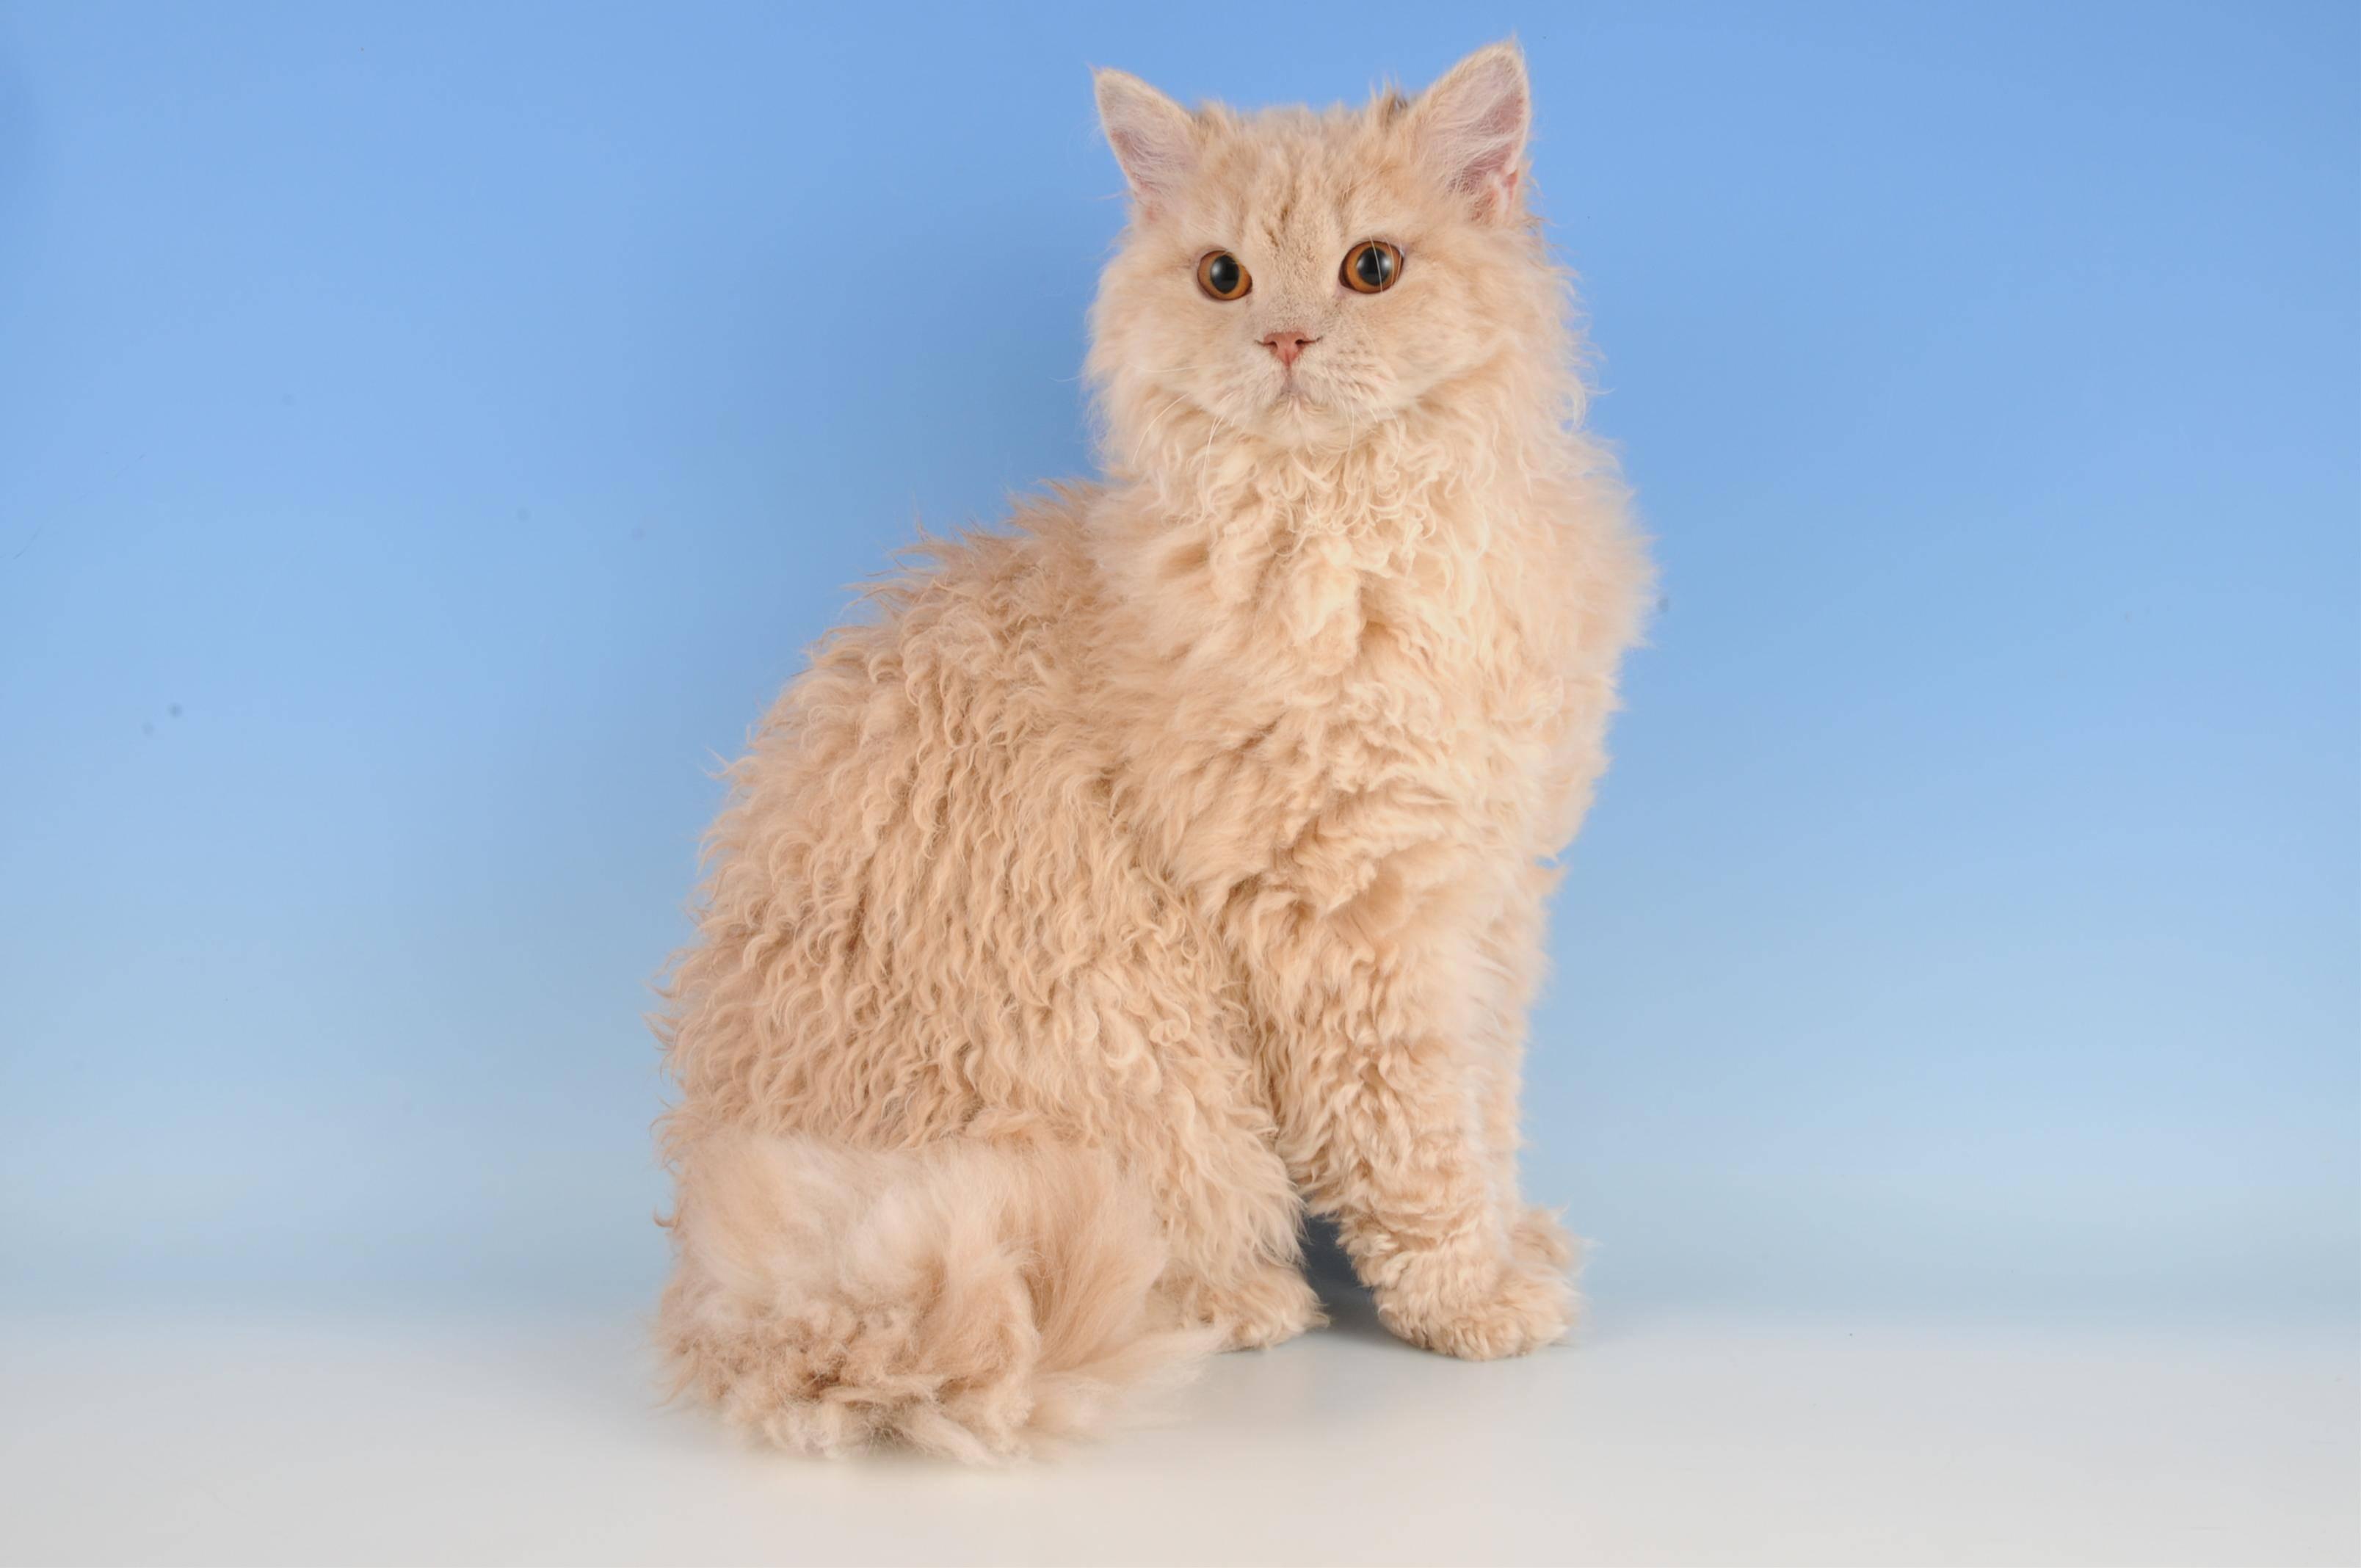 Кошки селкирк-рекс: описание породы, характер, цена, содержание и уход, фото